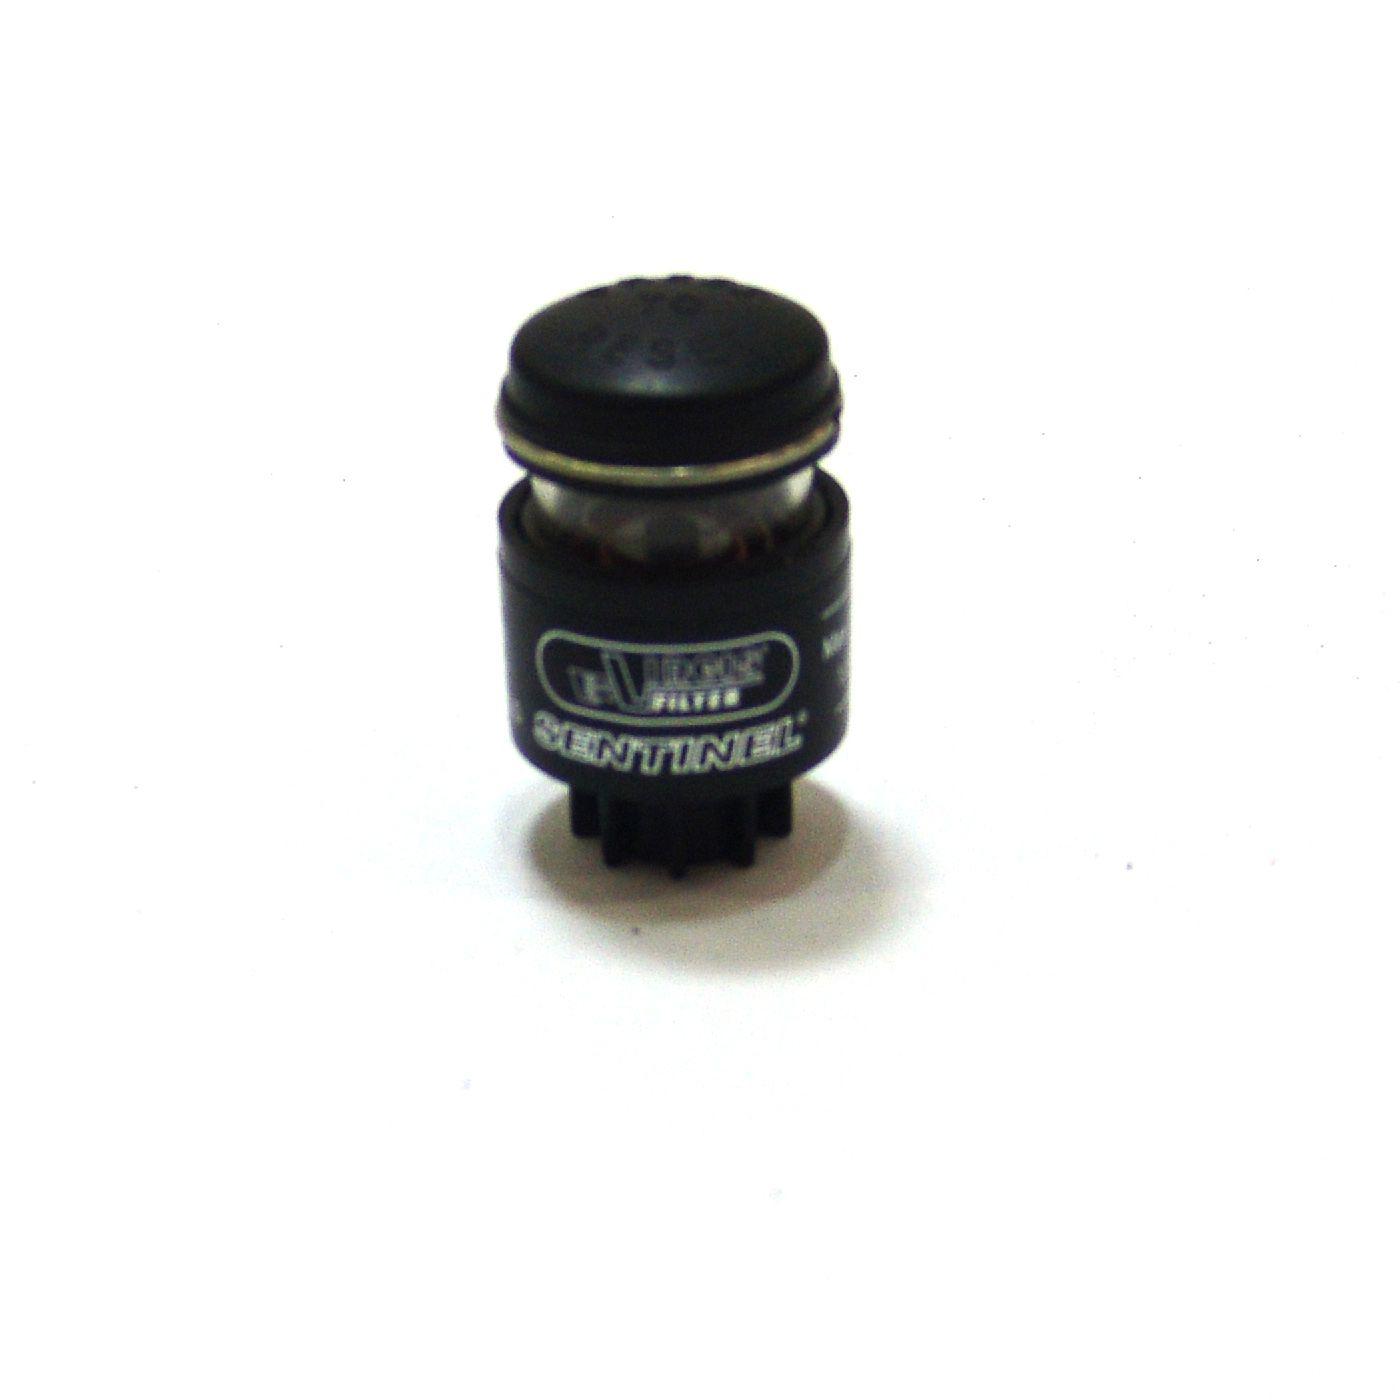 indicador restr mec filt ar fpt nef45 - pn 8027294